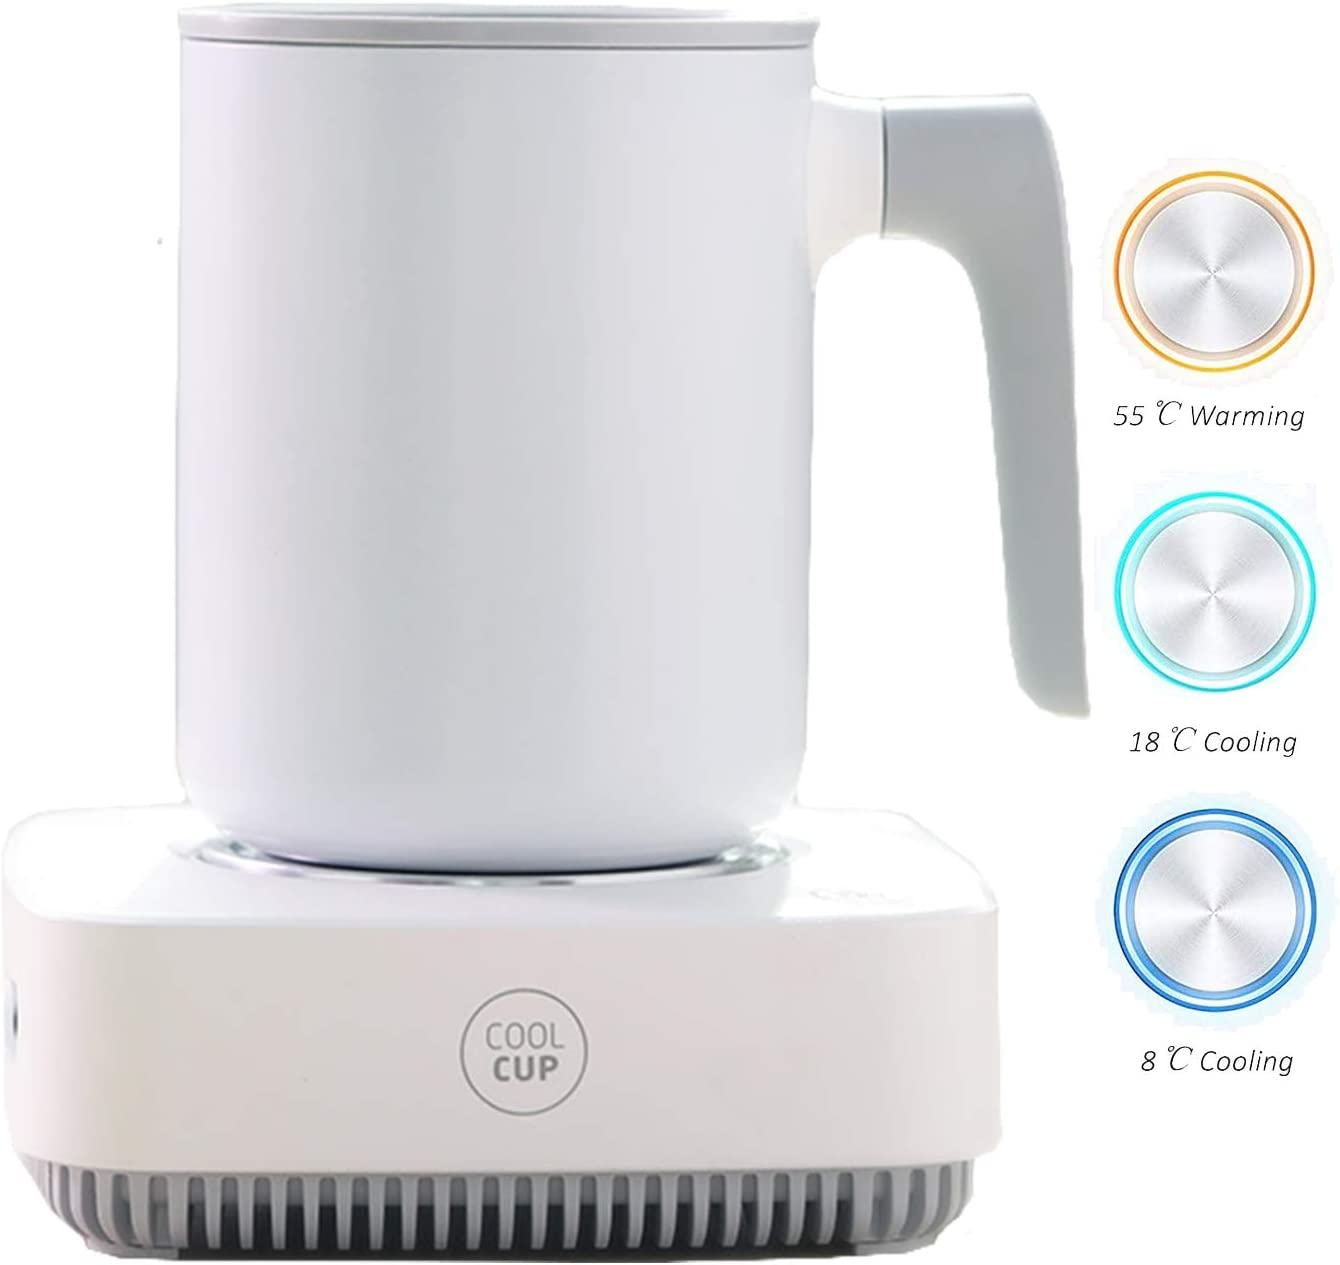 Coffee Warmer Cup Cooler Desktop 2in1, Coffee Tea Drinks Mug Warmer or Cooler Desktop, 31℉ - 46℉ Heating and Cooling Beverage Plate For Water,Milk,Beer,Cocoa